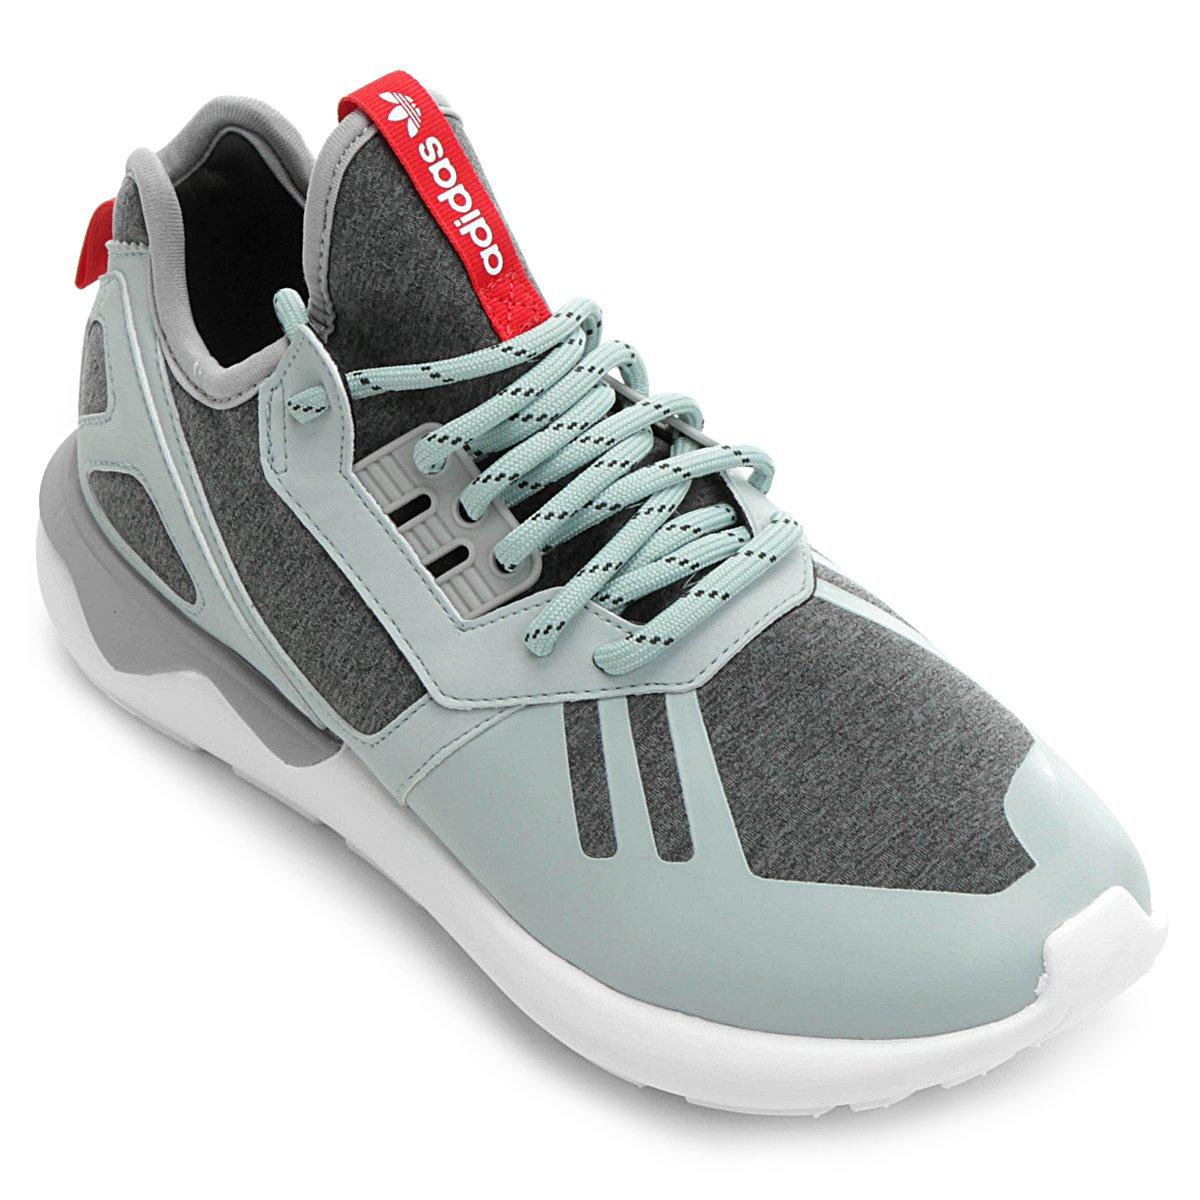 7e87e5378333 Tênis Adidas Tubular Runner Weave - Cinza e Verde Água